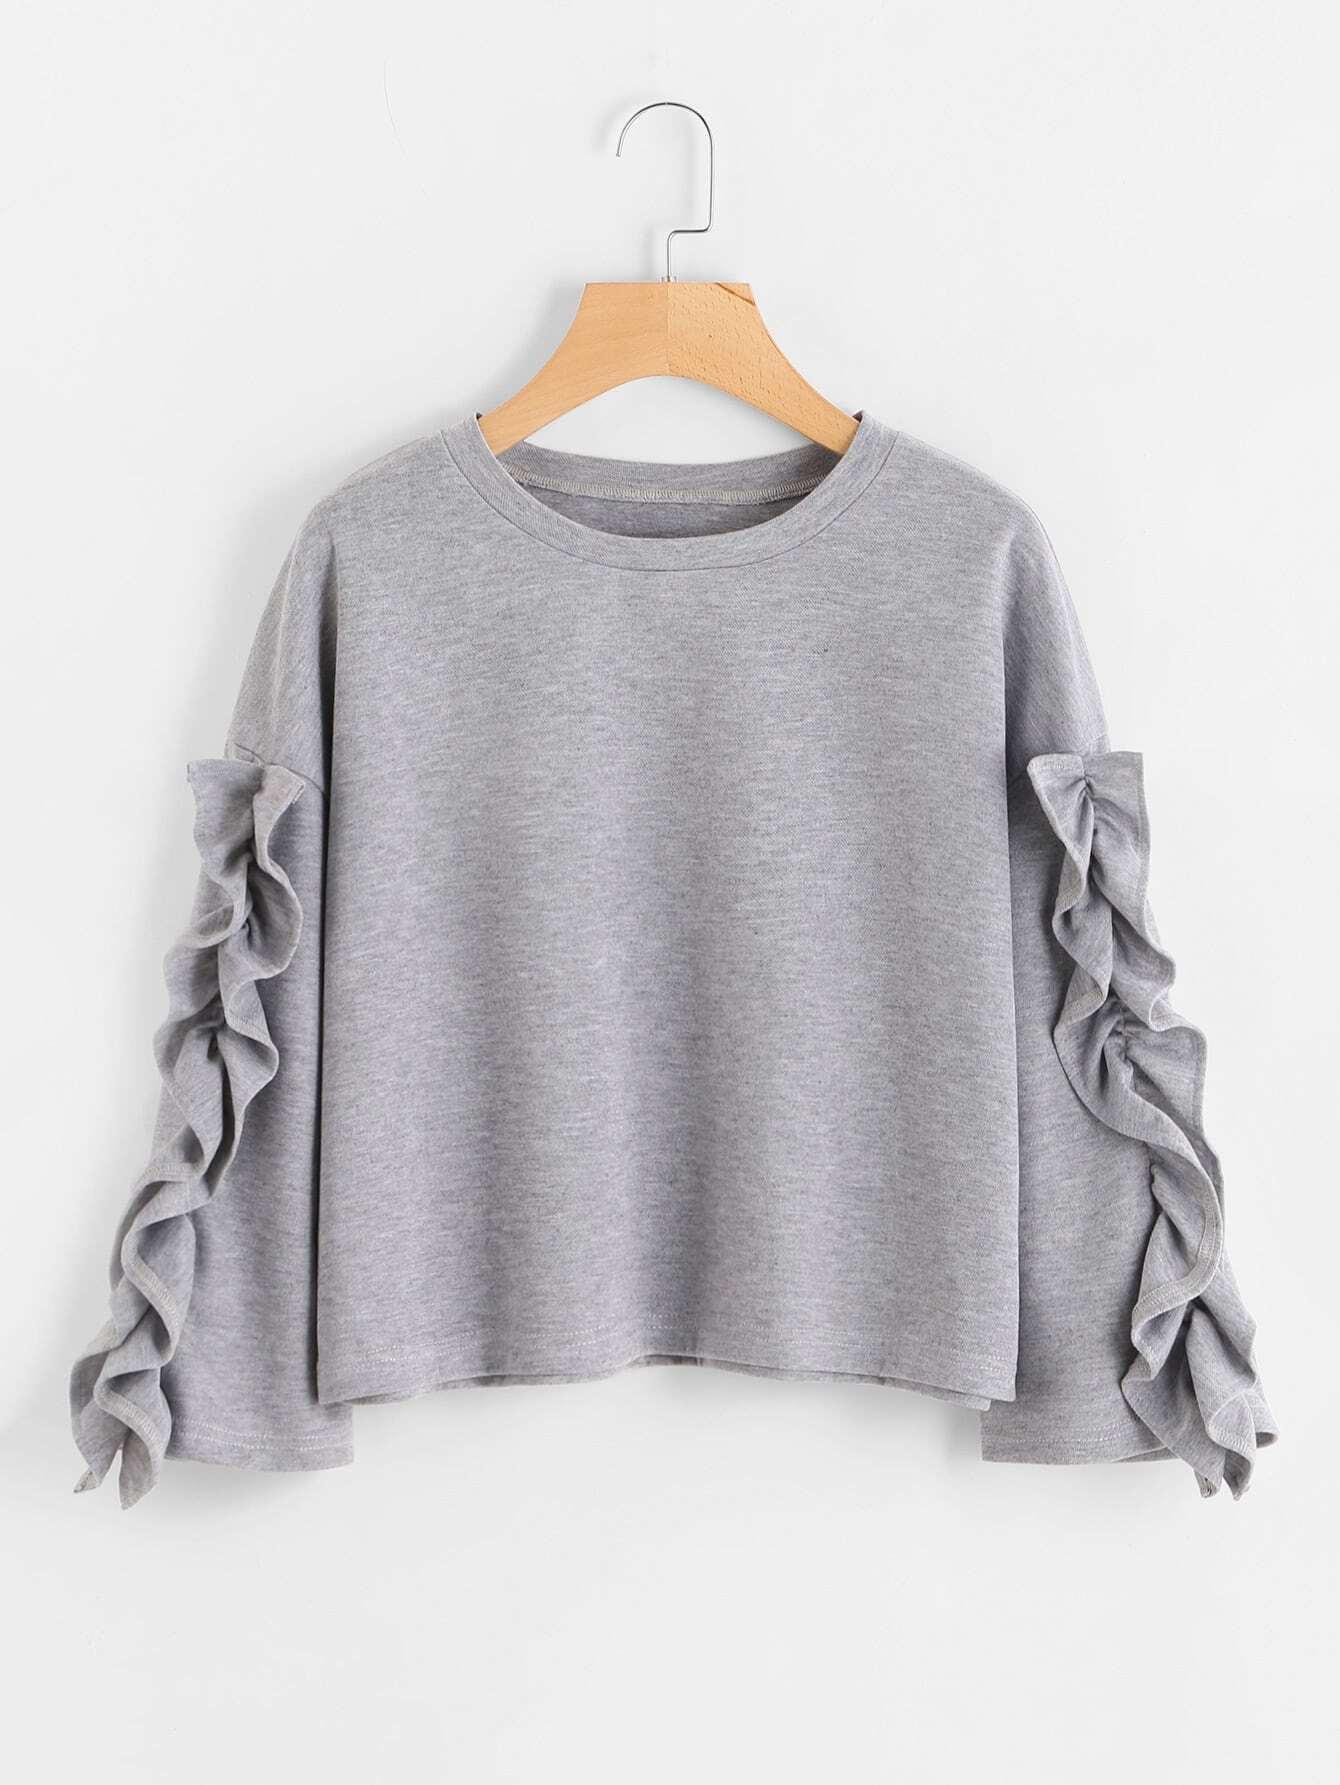 Ruffle Sleeve Drop Shoulder Sweatshirt drop shoulder frilled sleeve sweatshirt